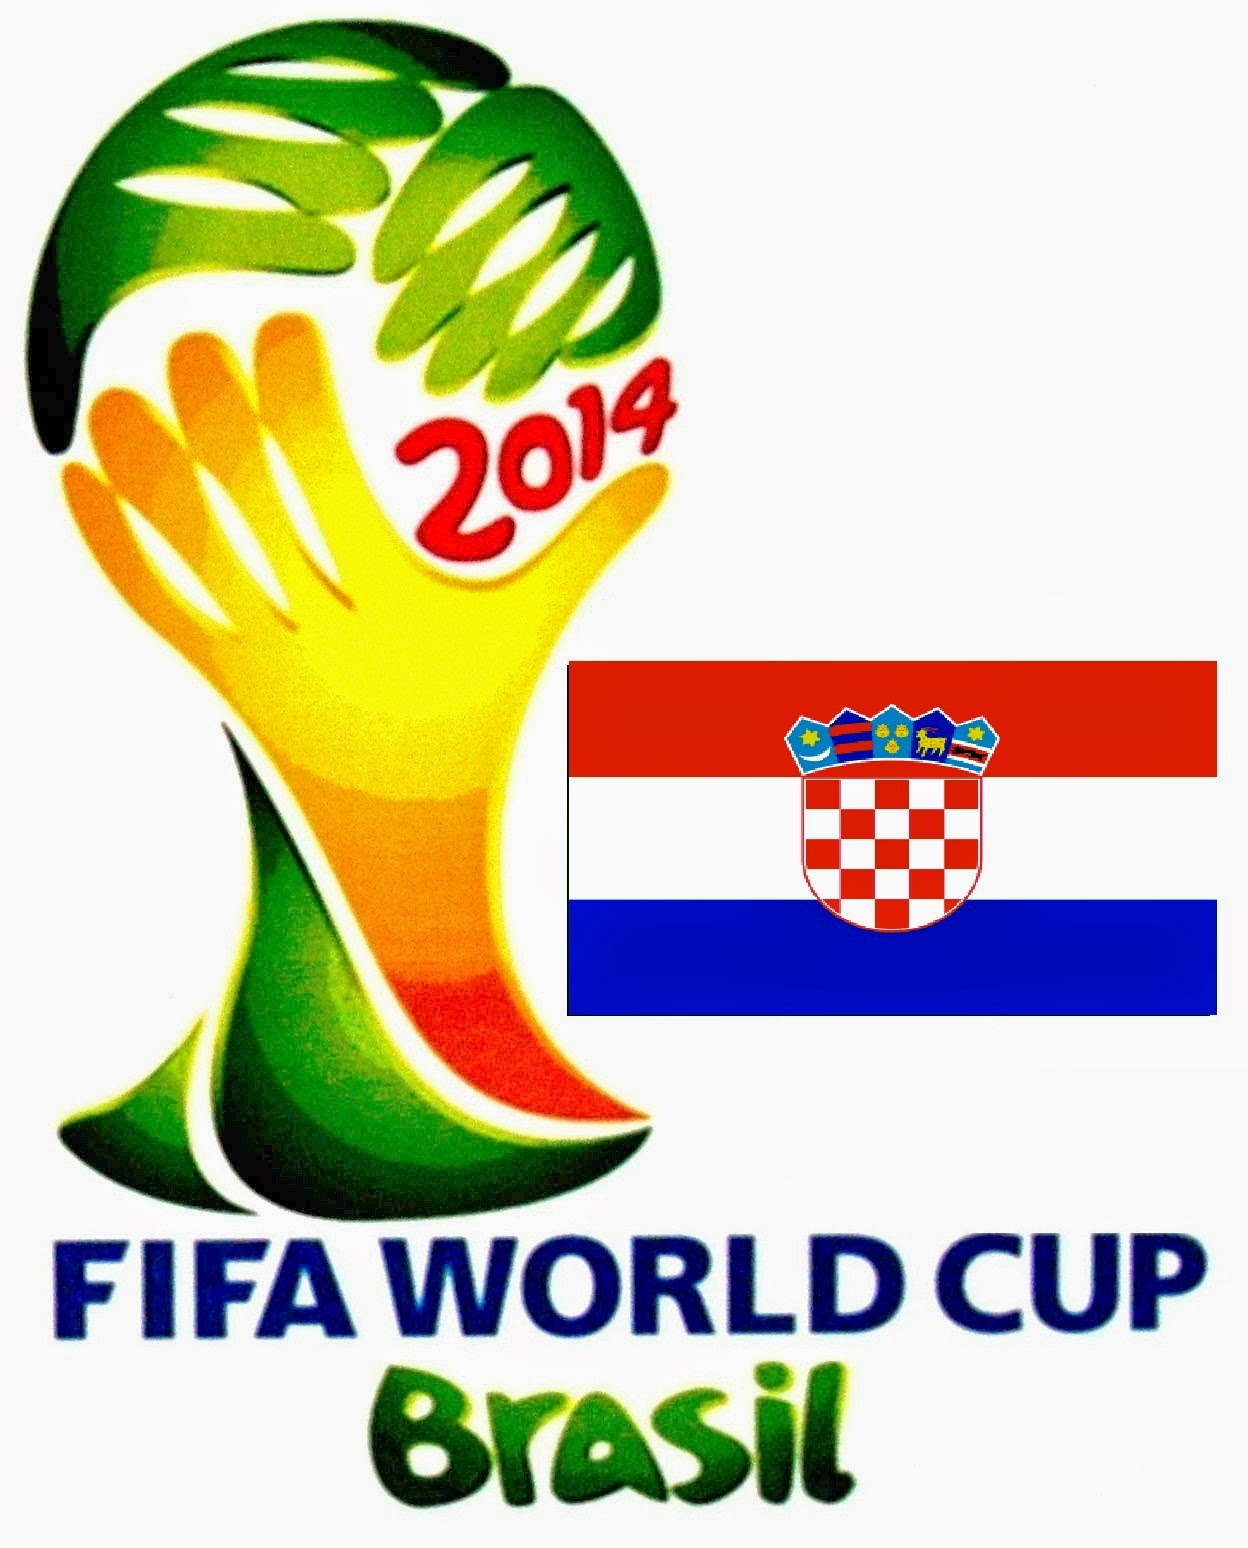 Daftar Nama Pemain Timnas Kroasia Piala Dunia 2014